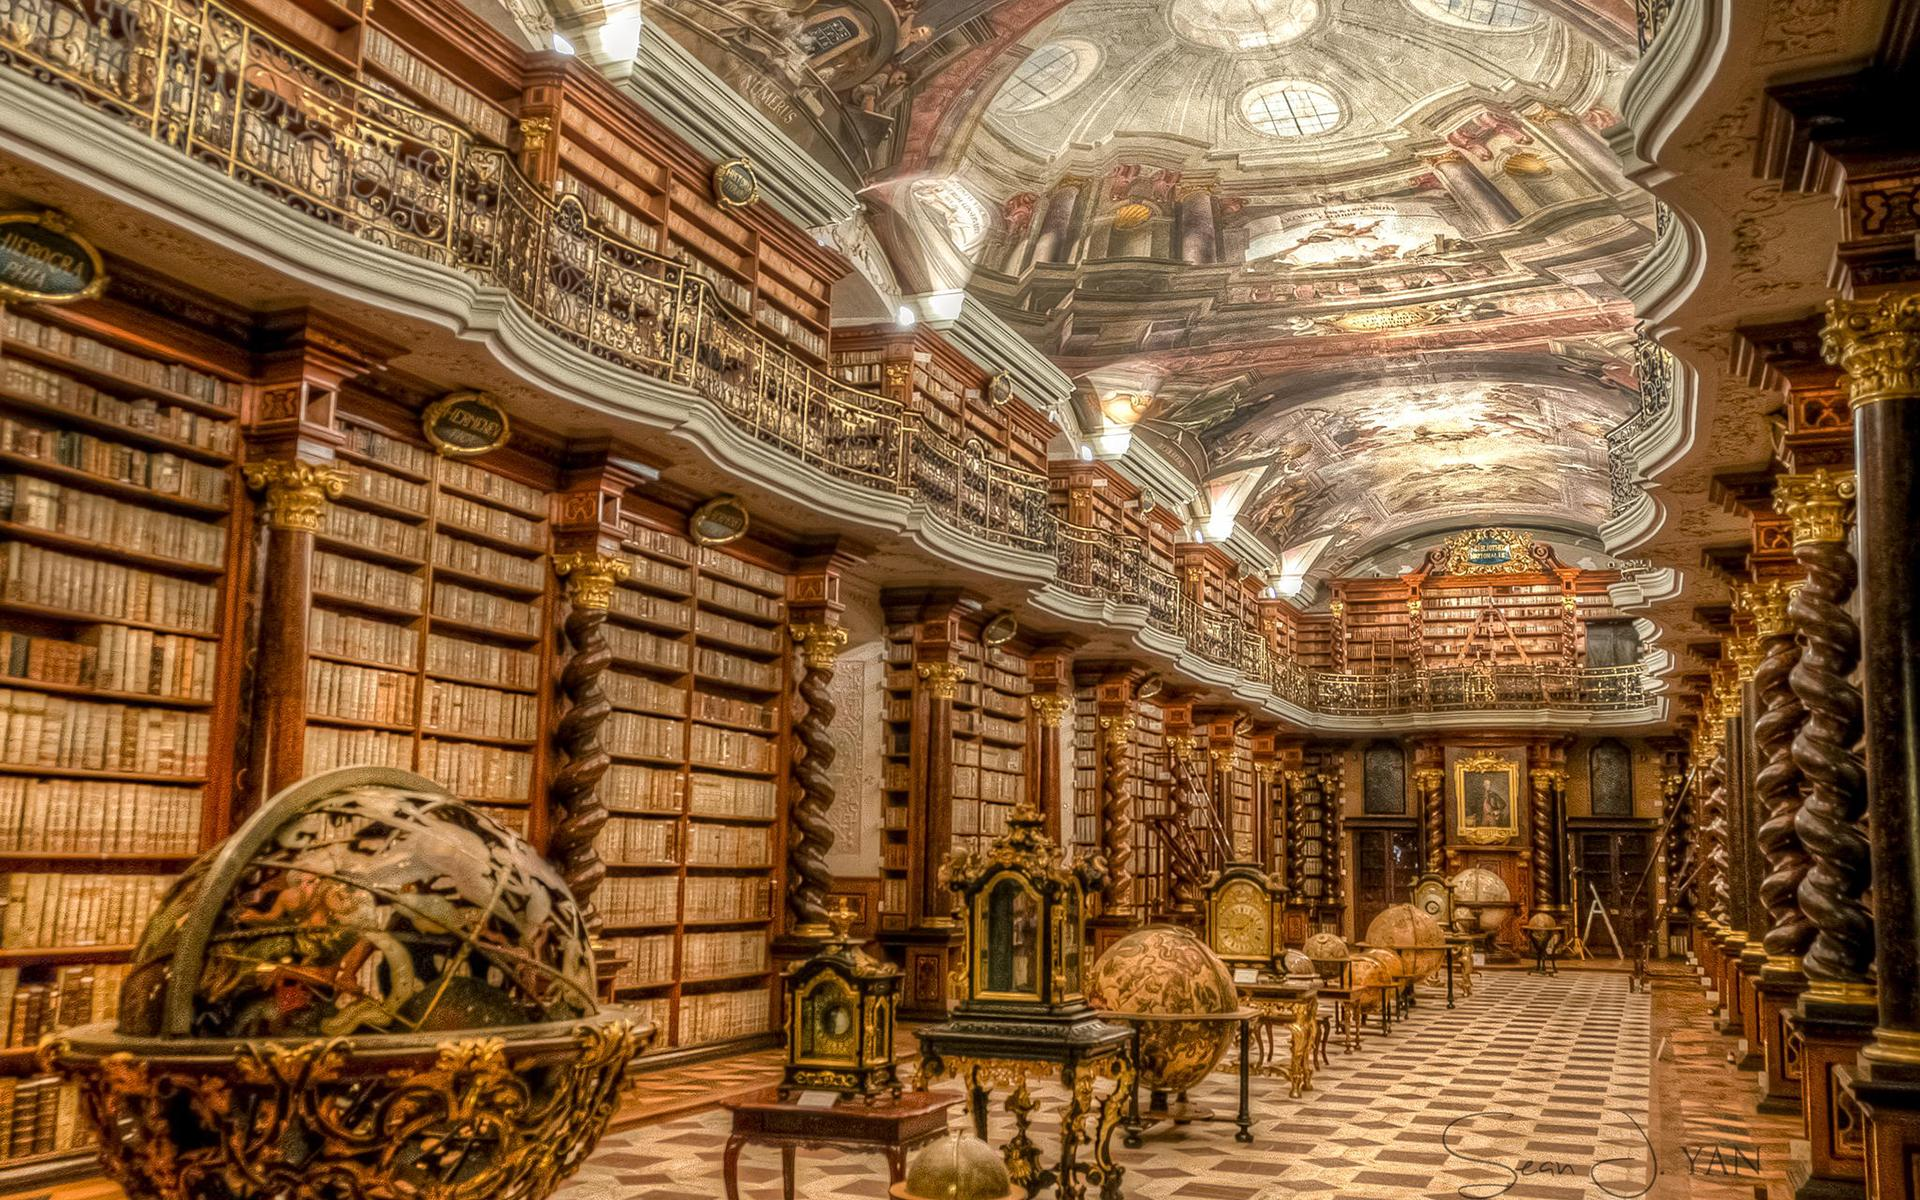 https://www.recreoviral.com/wp-content/uploads/2015/09/La-biblioteca-m%C3%A1s-hermosa-del-mundo-en-Rep%C3%BAblica-Checa-6.jpg